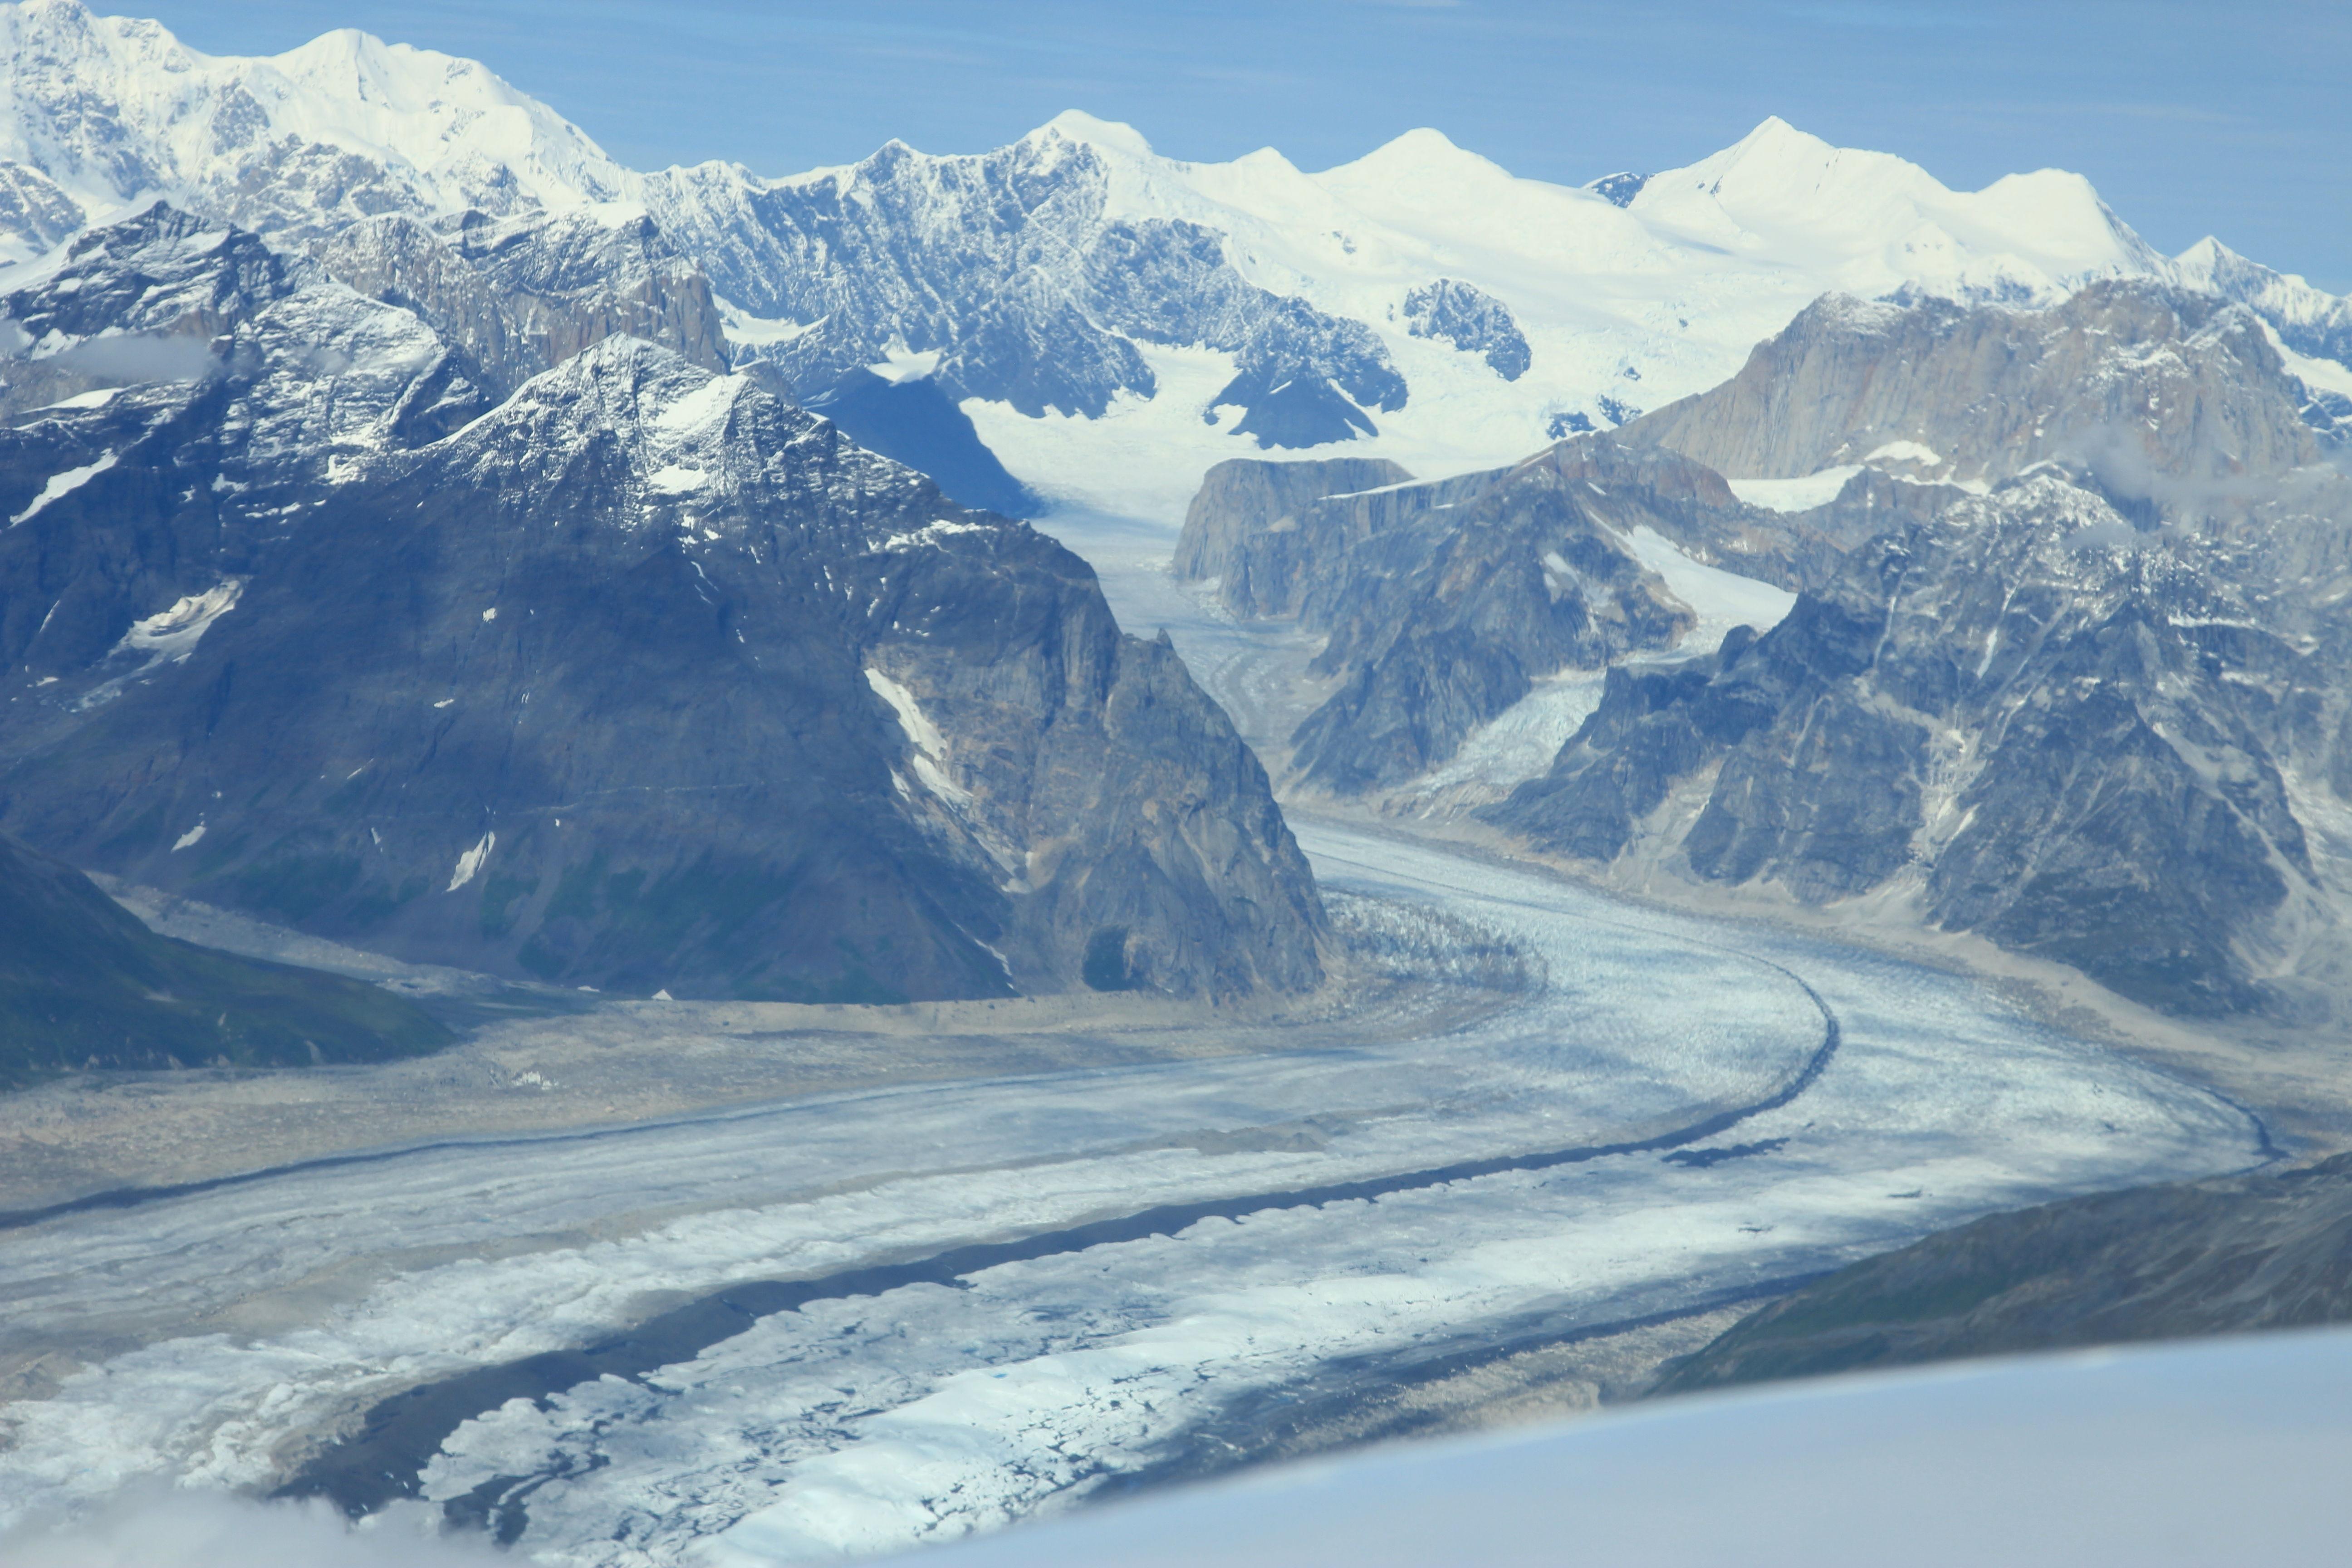 Alaska The McKinley Explorer Movie HD free download 720p